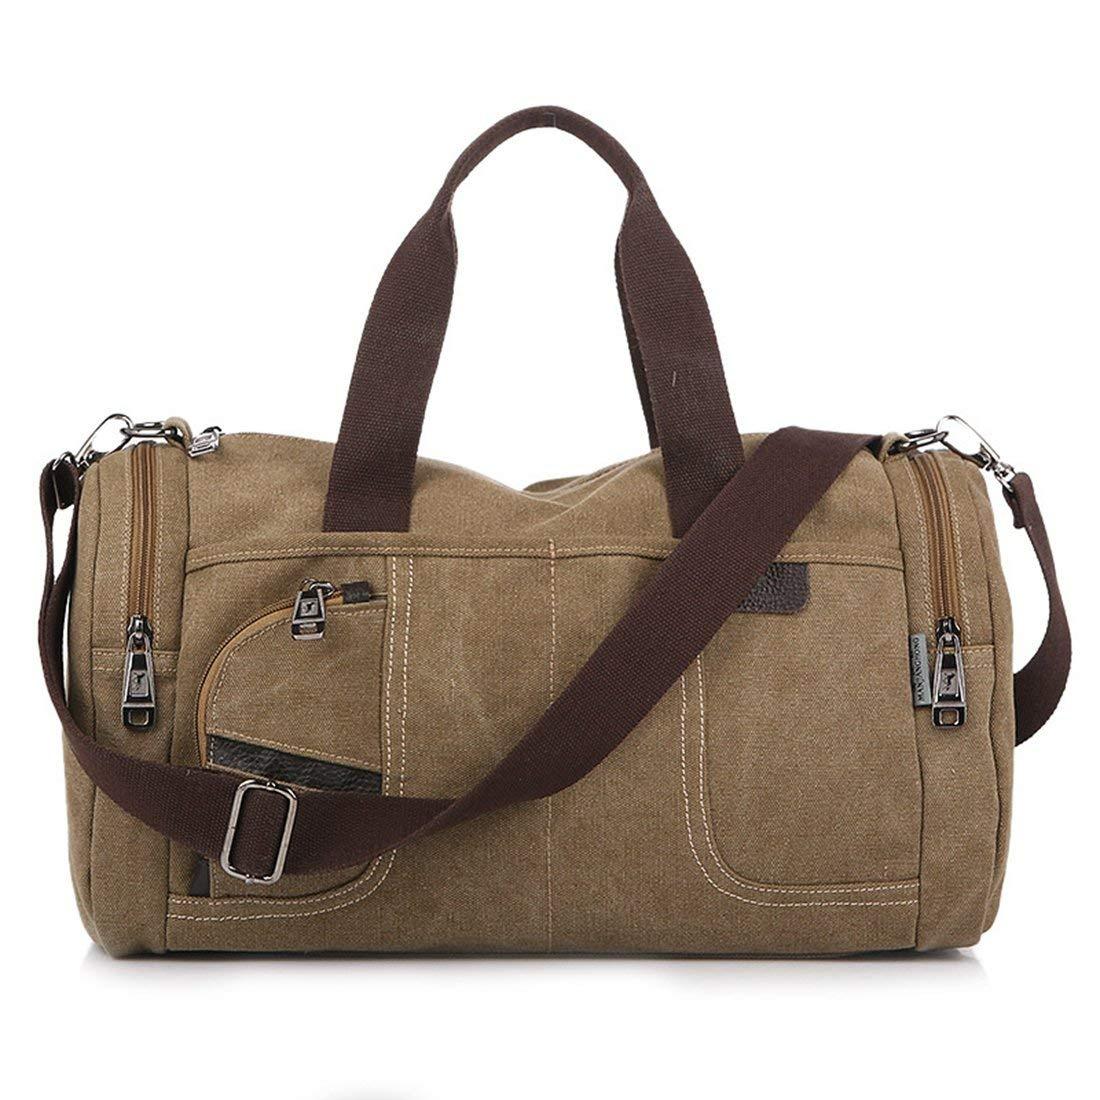 8dd001686538 FHGJ Gym Bag, Waterproof Sports Duffle Bag Training Handbag Travel Shoulder  Tote Bag